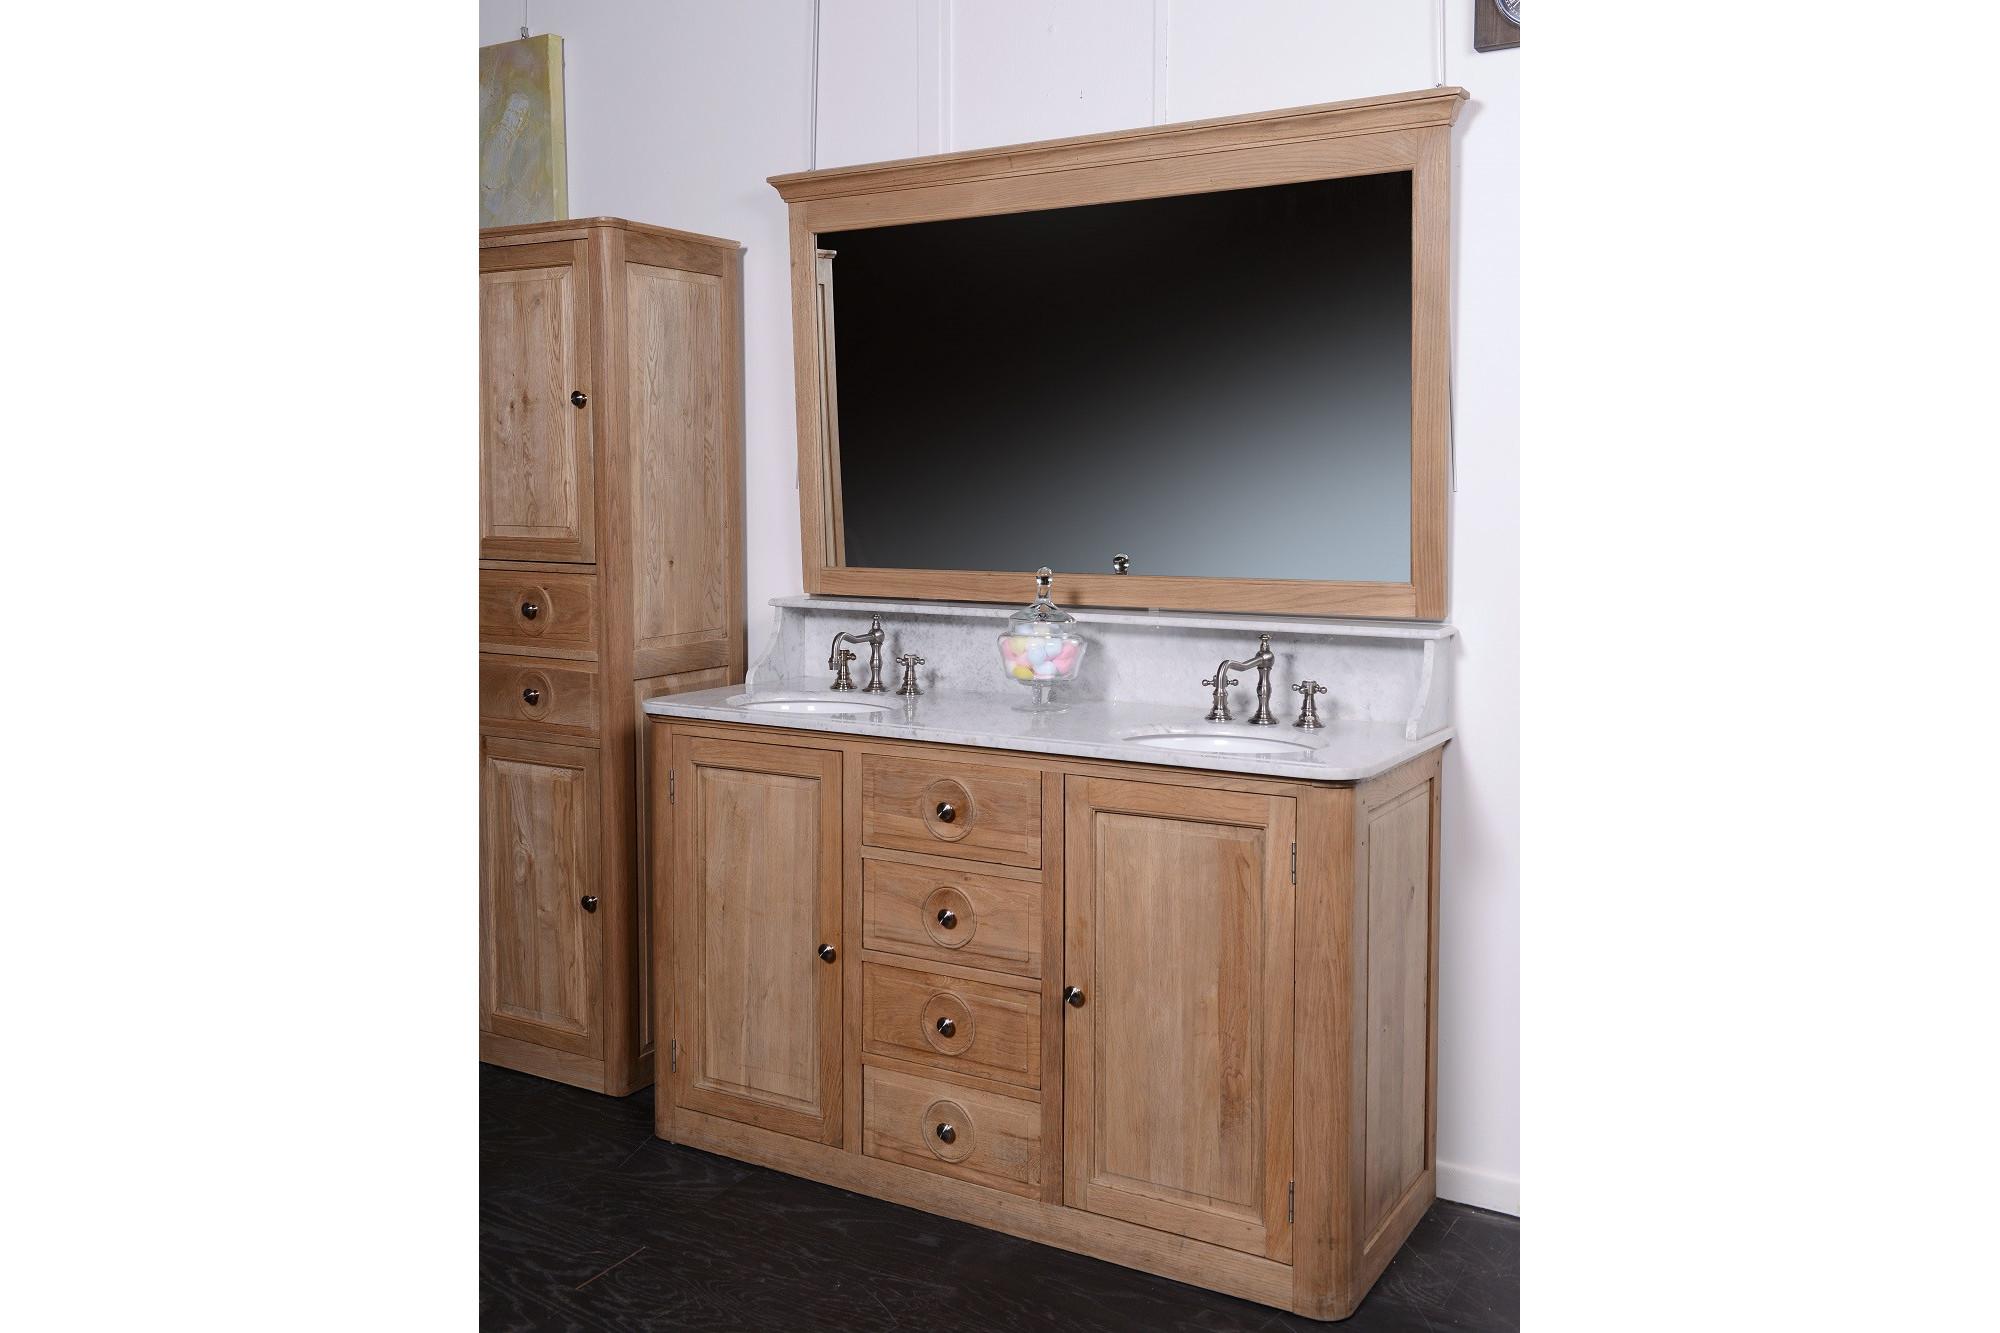 Meuble sdb en bois double vasque louis hellin - Meuble sdb double vasque ...